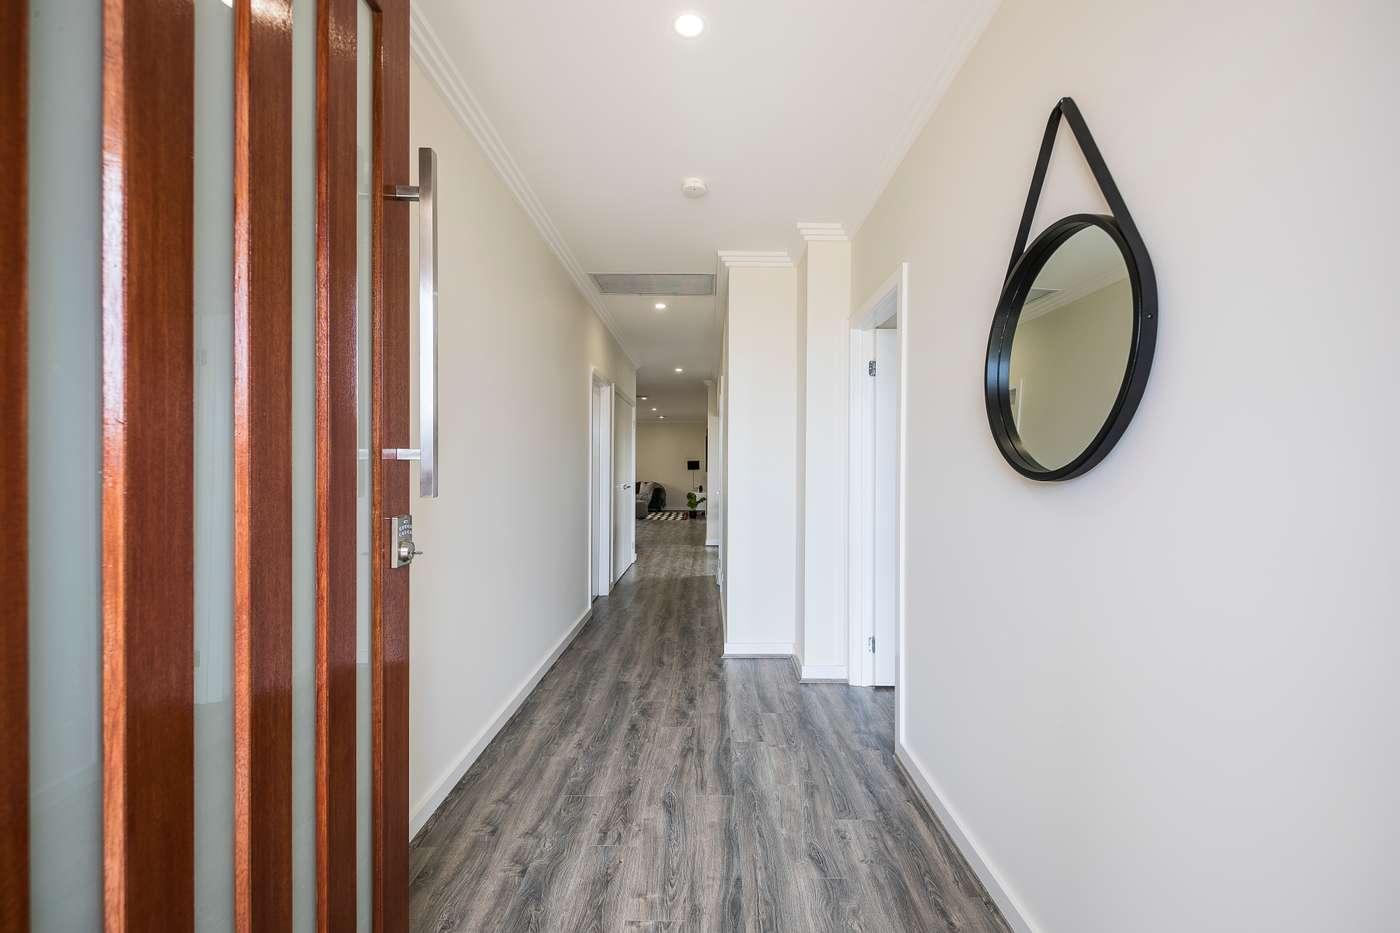 Main view of Homely house listing, 113 Ellscott Boulevard, Mickleham, VIC 3064